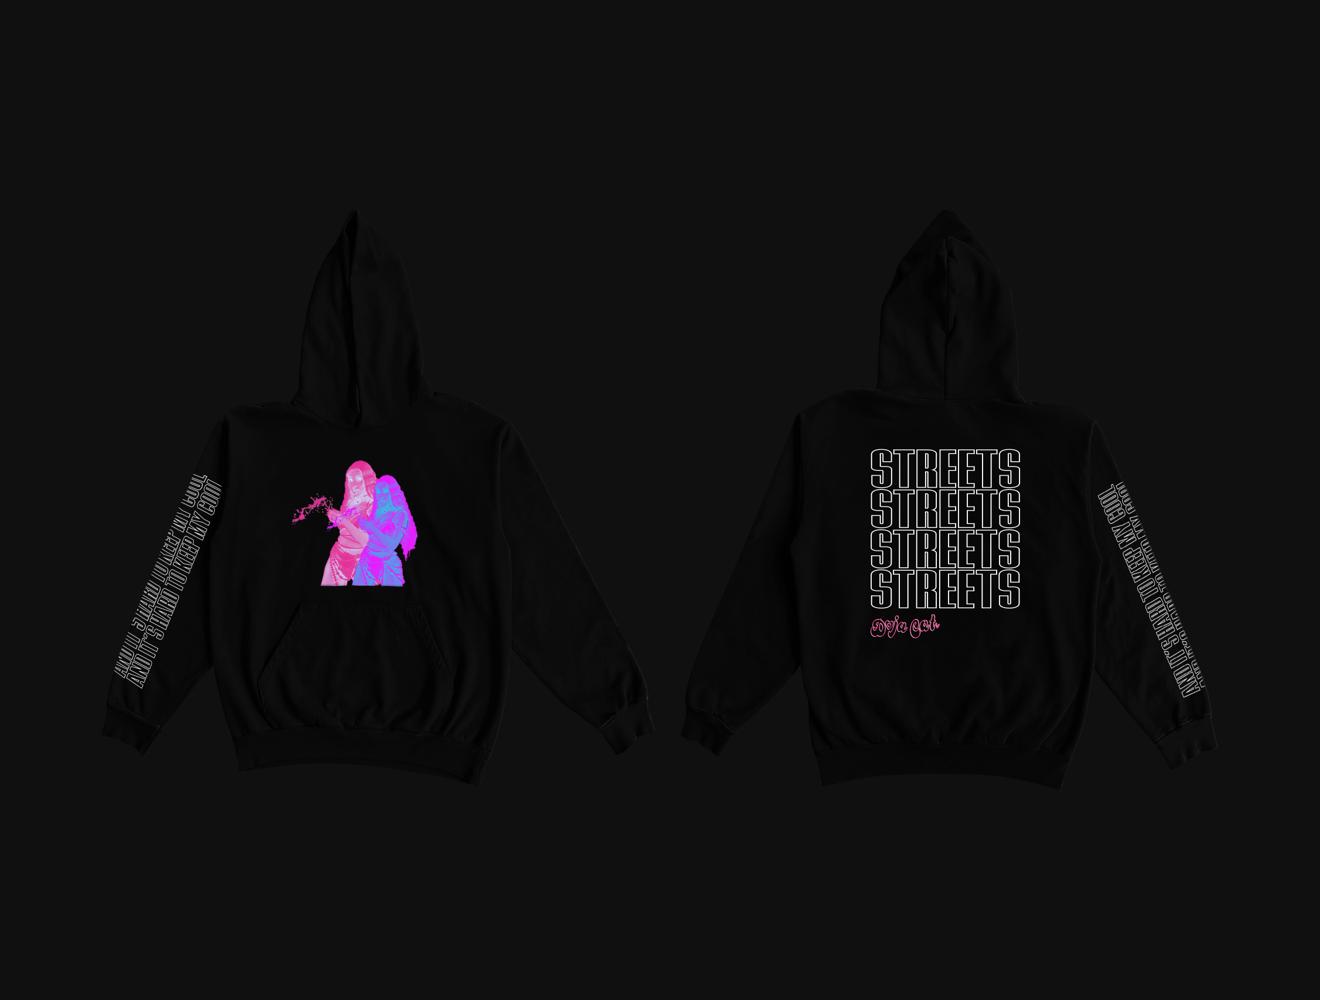 Doja Cat Sweatshirt Design Two